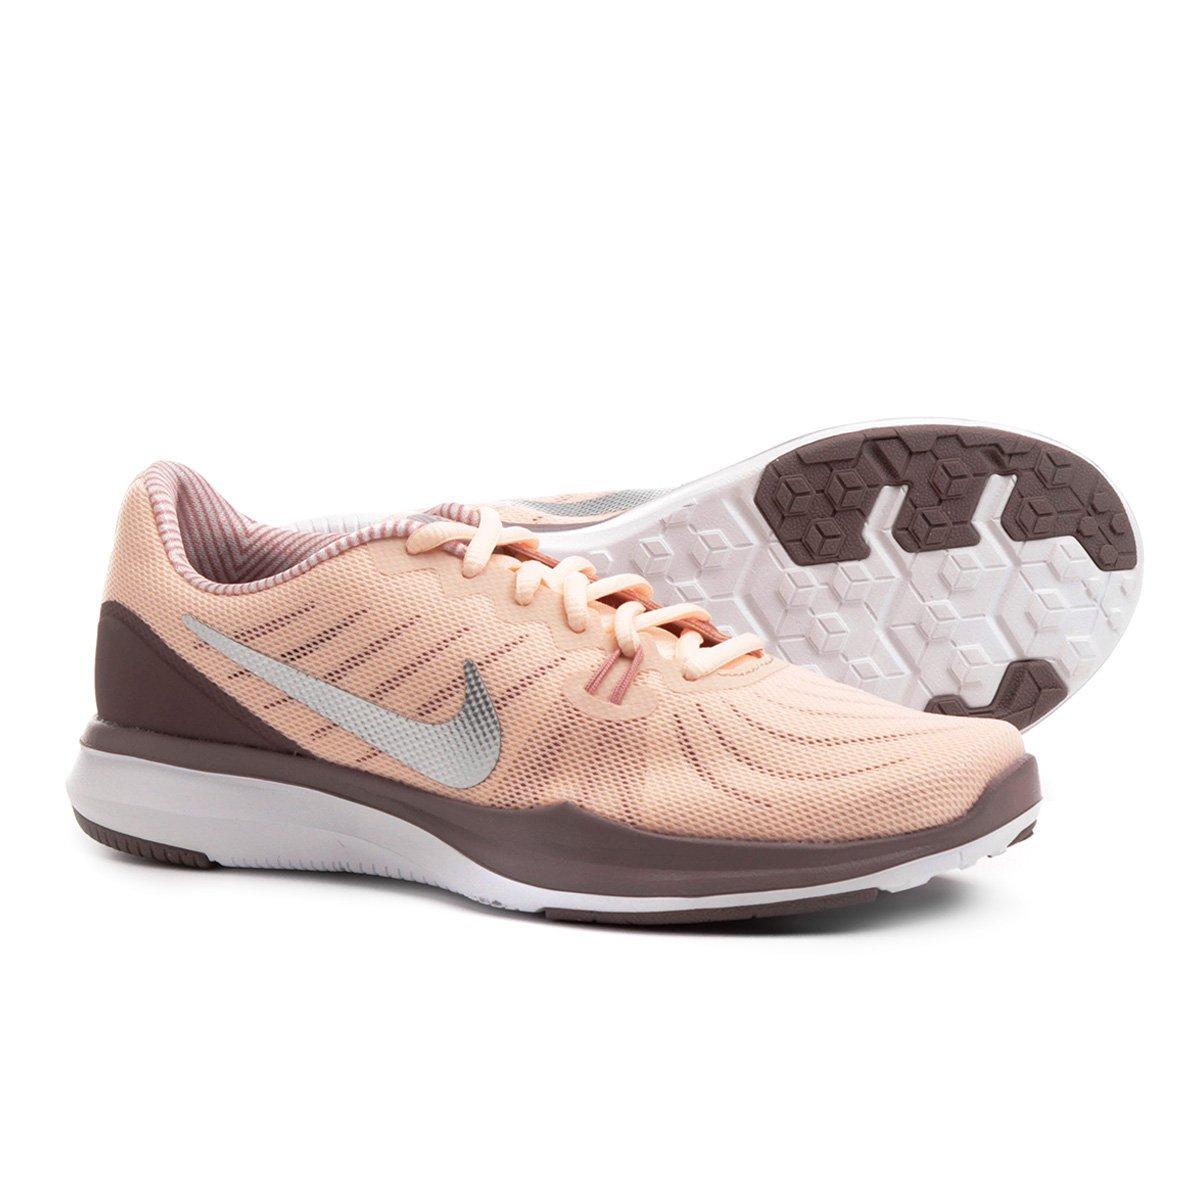 Tênis Nike In-Season TR 7 BN Feminino - Compre Agora  d2d5f413f34de